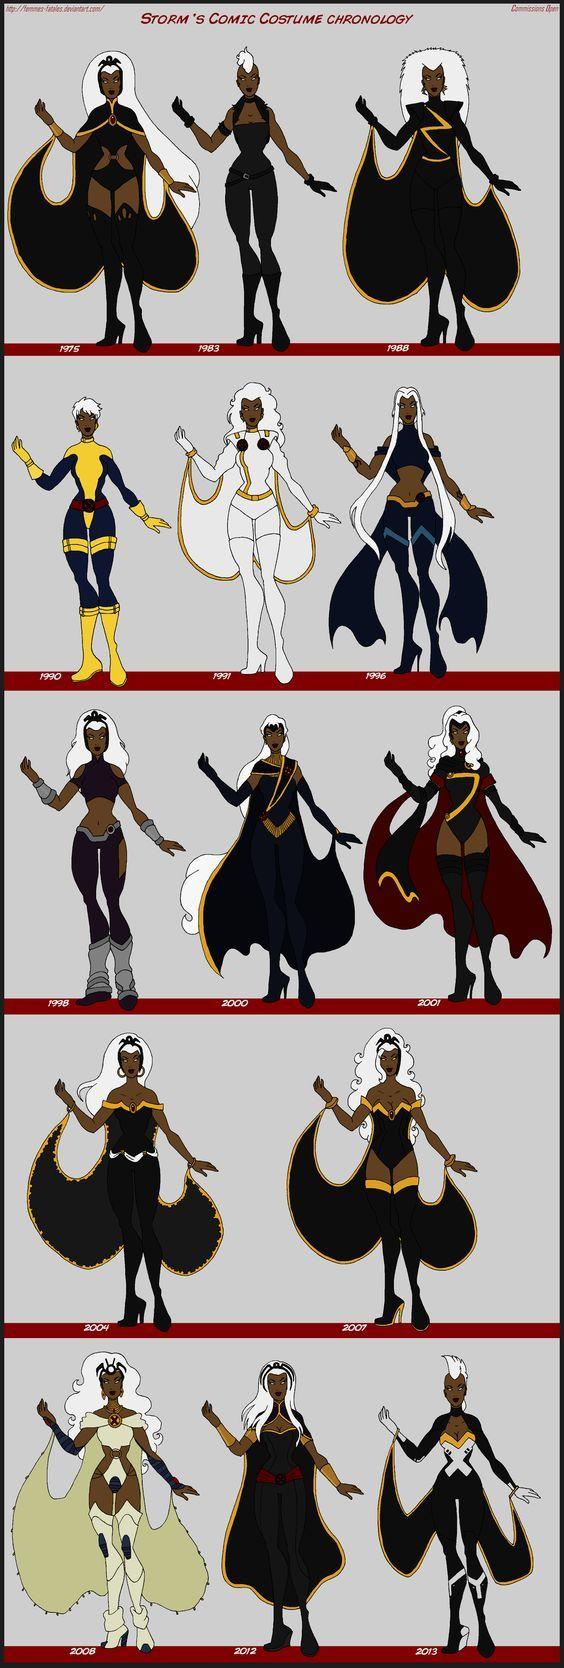 X-Men - Storm Comic Costume Chronology by Femmes-Fatales.deviantart.com on @deviantART: